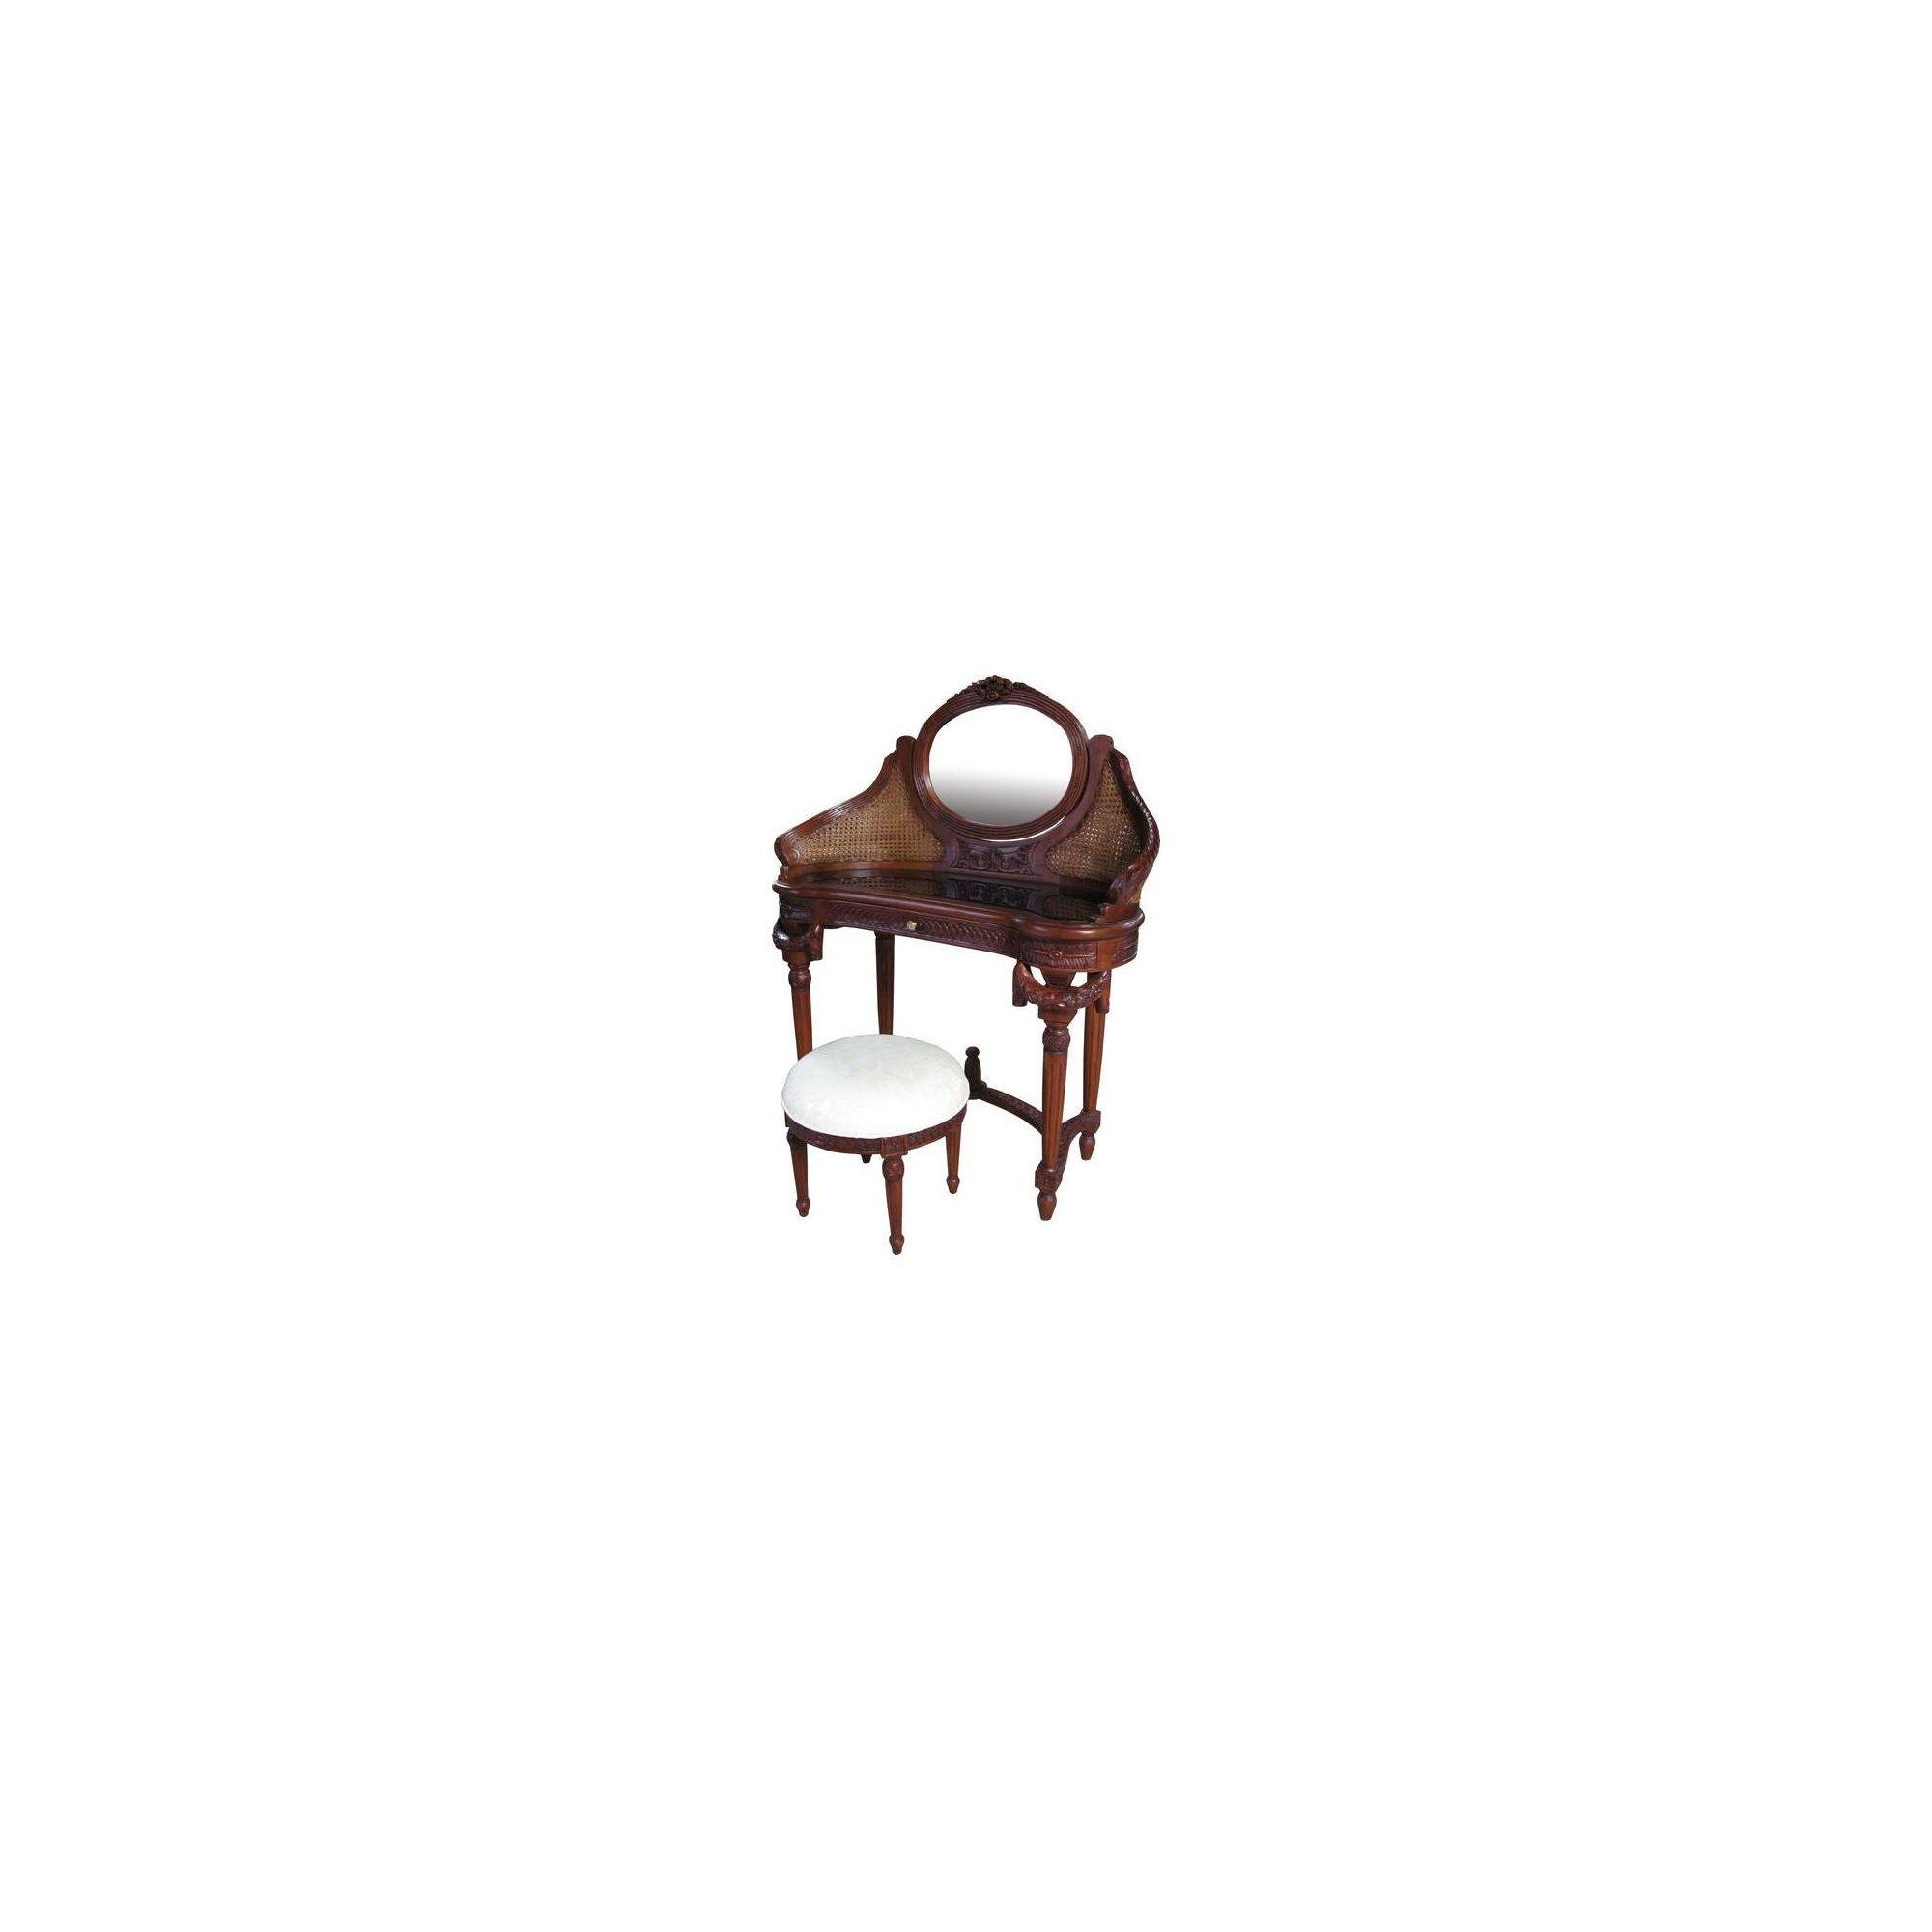 Lock stock and barrel Mahogany Rattan Dressing Table in Mahogany - Wax at Tescos Direct